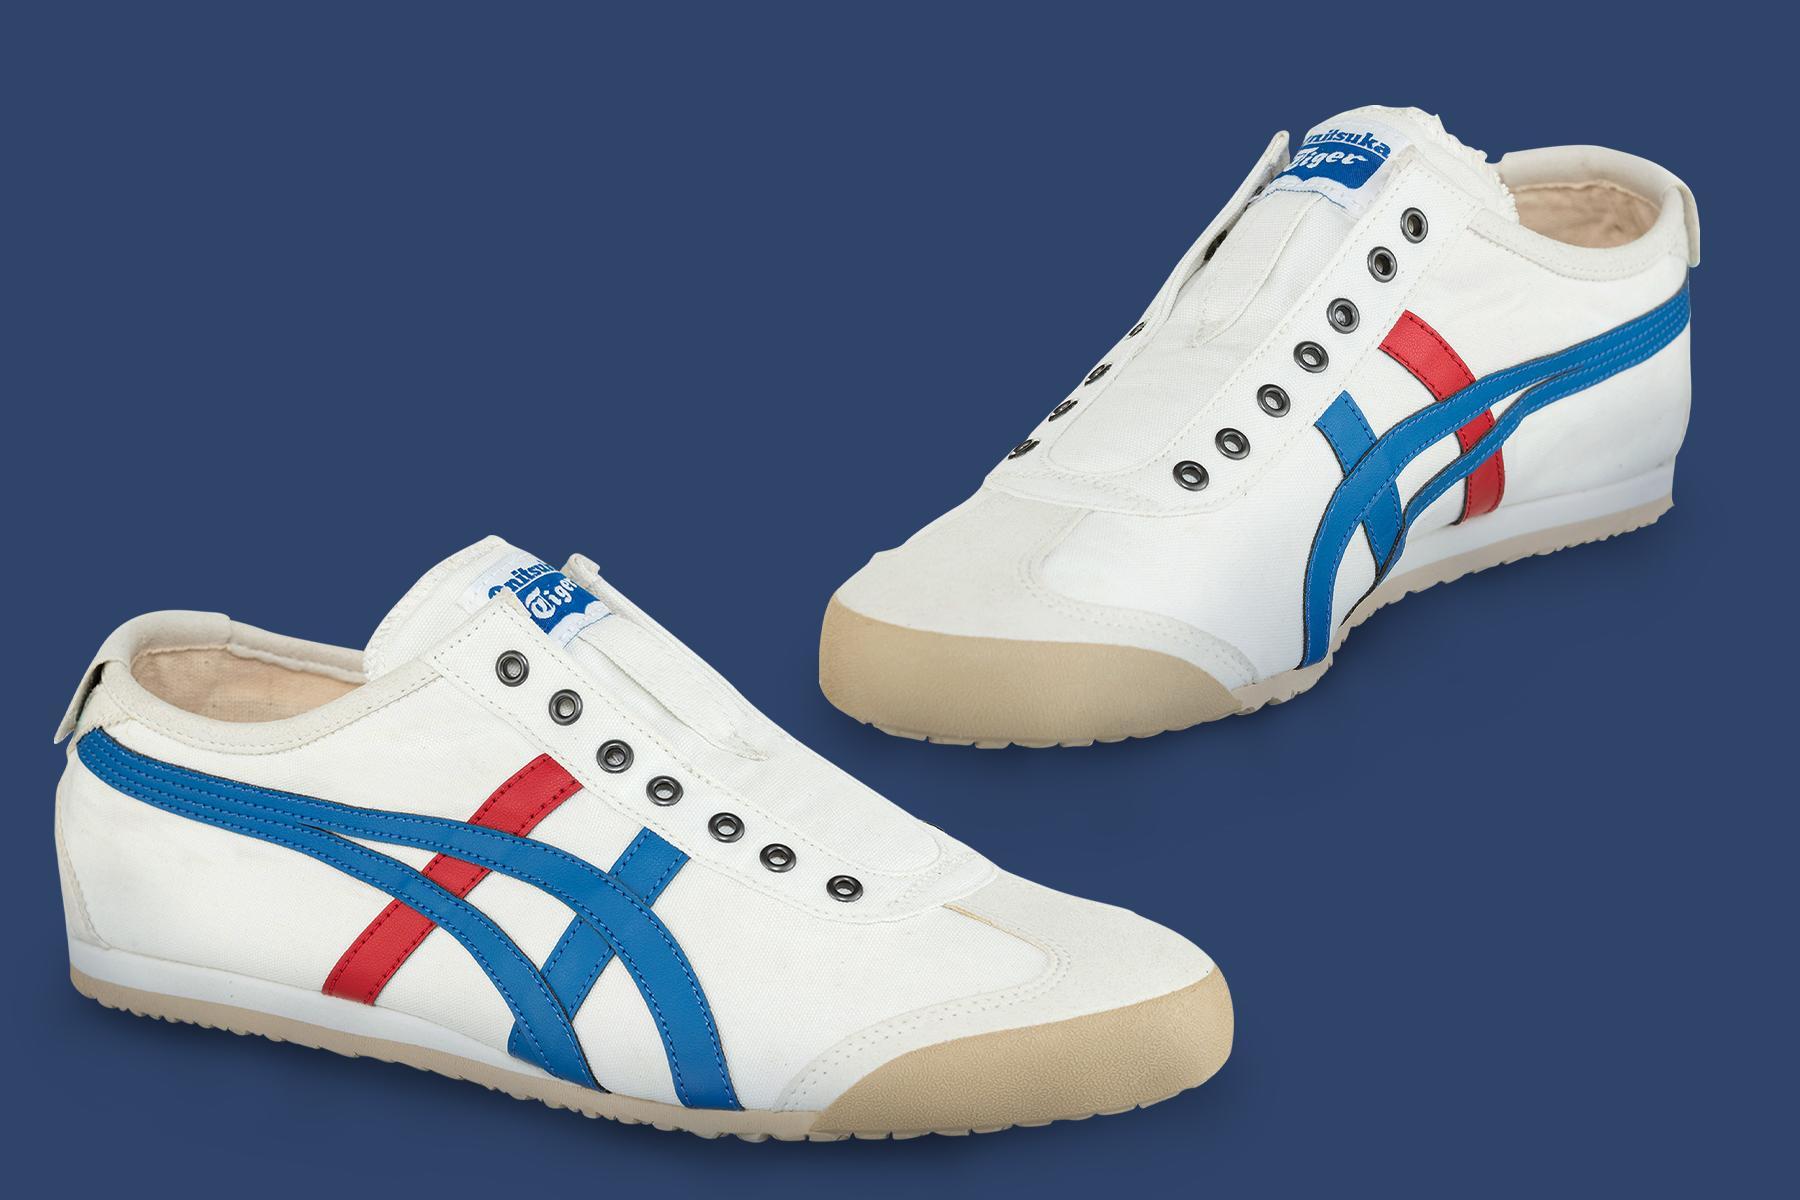 onitsuka tiger mexico 66 shoes online orlando 50